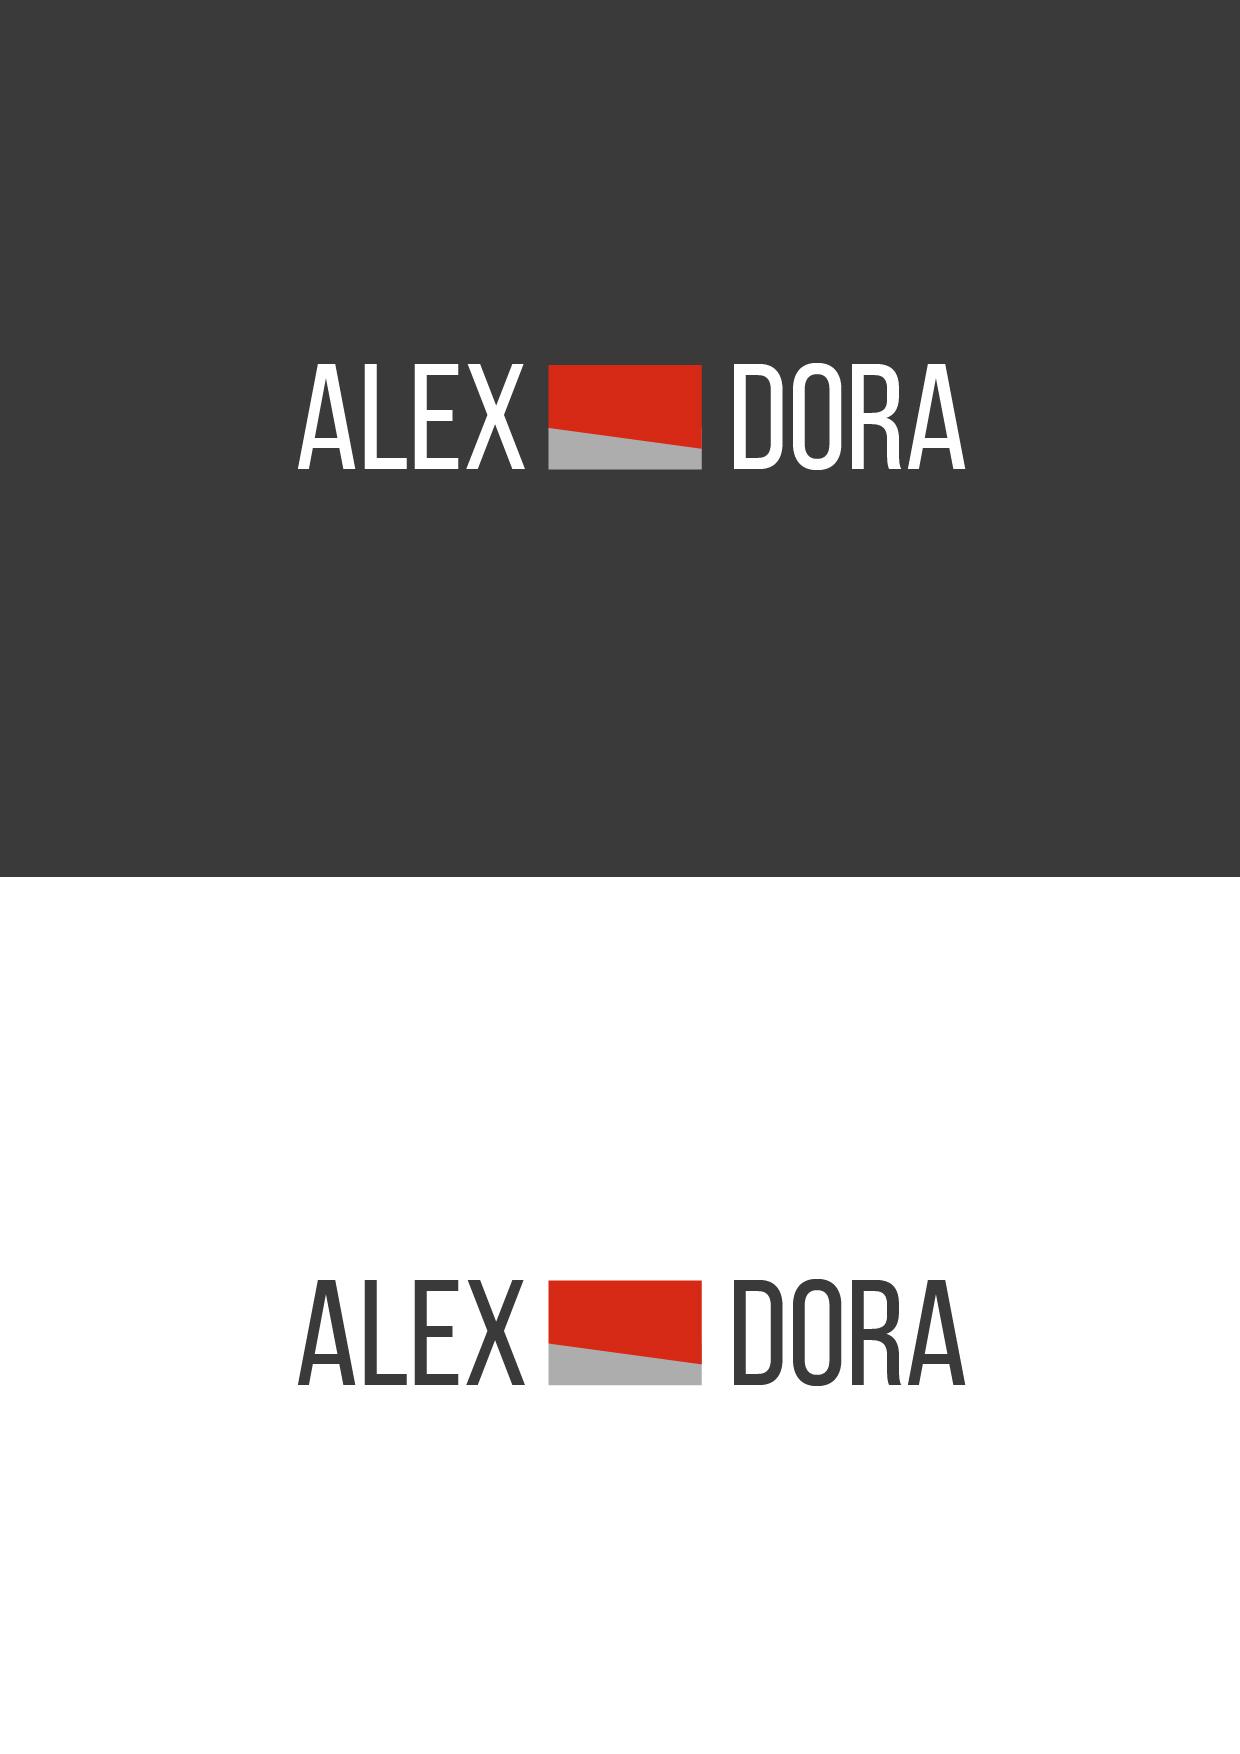 Необходим дизайнер для доработки логотипа бренда одежды фото f_2565b366dfbeae56.jpg